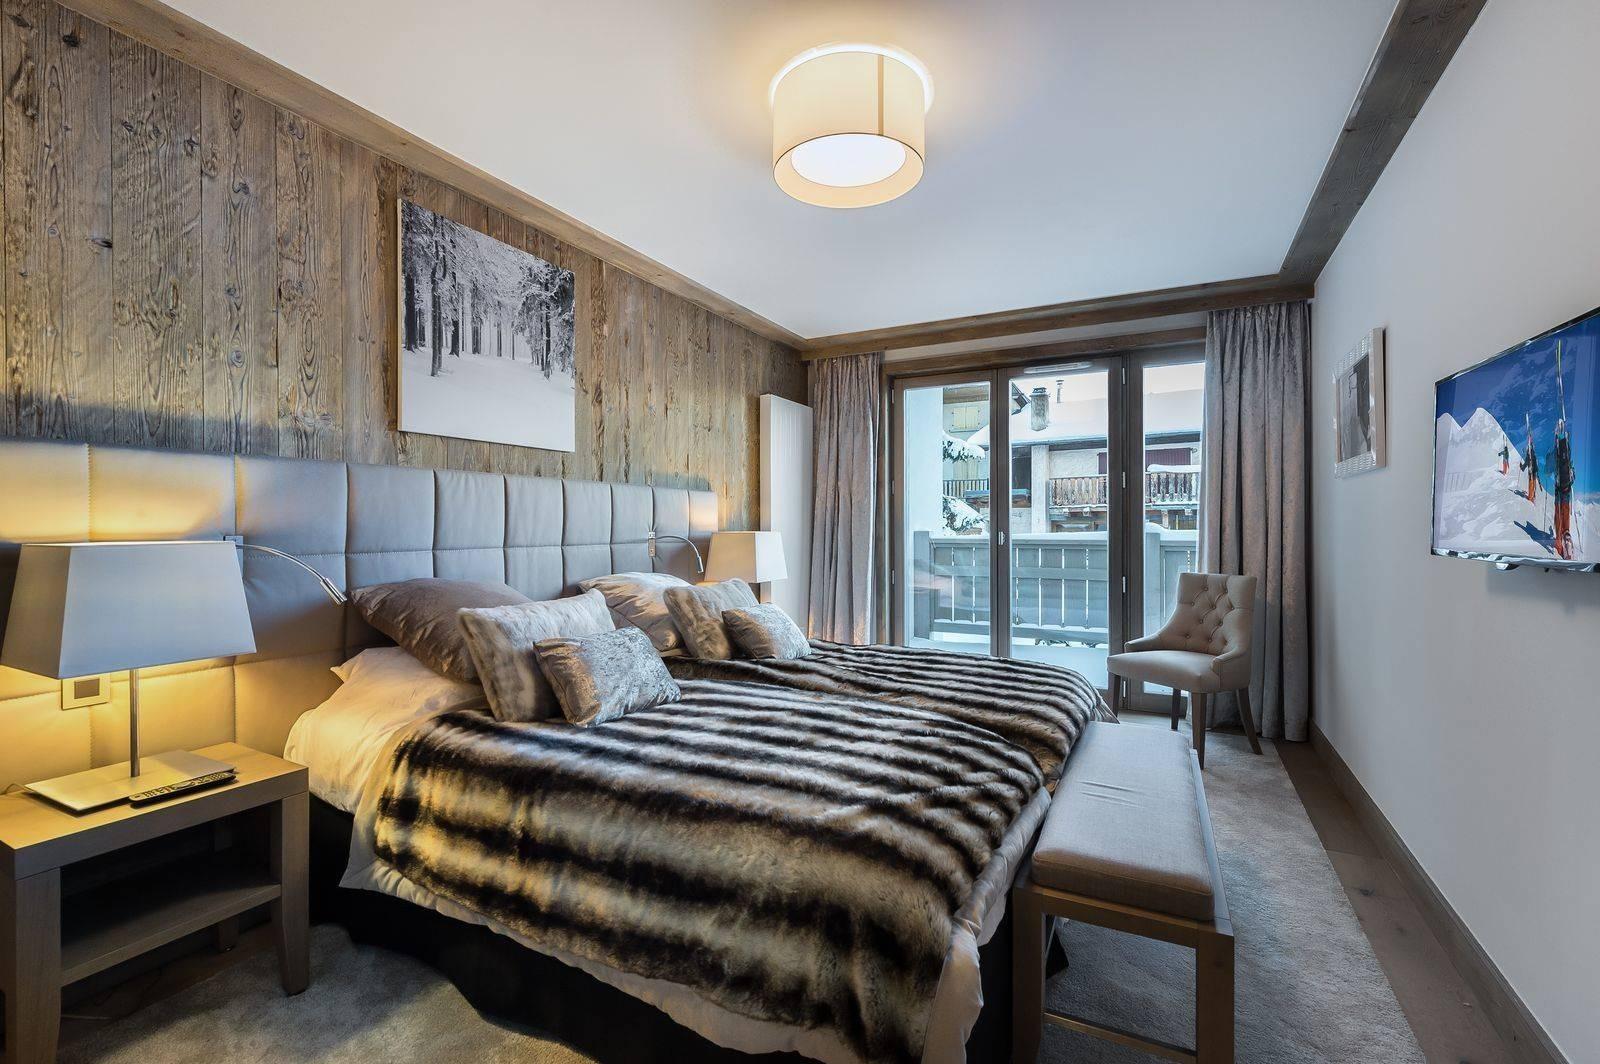 Courchevel 1550 Location Appartement Luxe Telokia Chambre